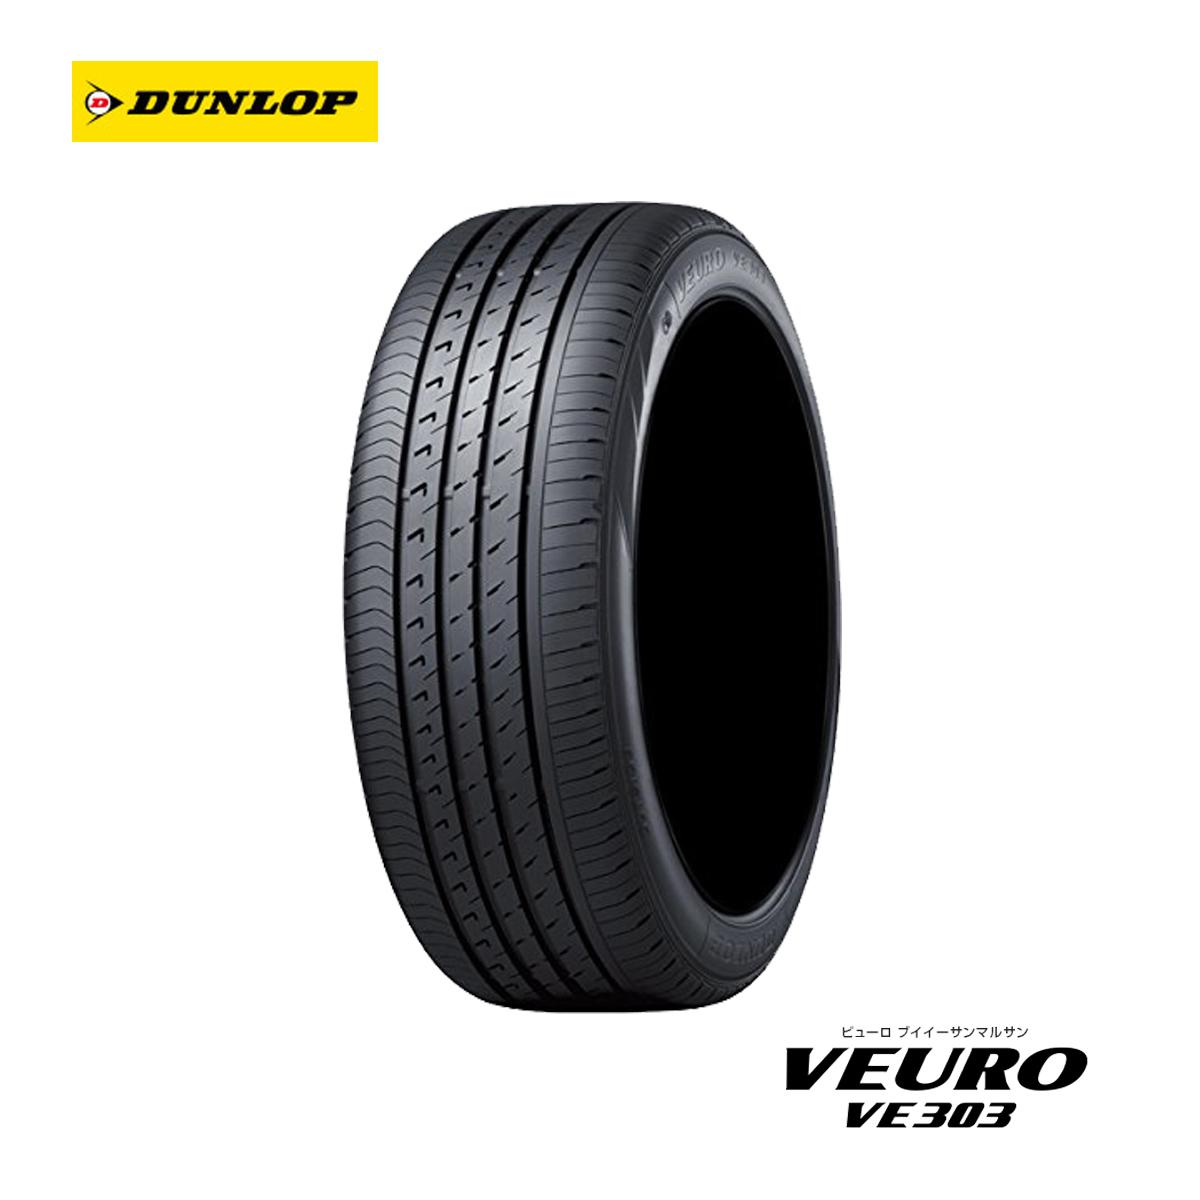 DUNLOP ダンロップ 吸音スポンジ搭載 プレミアム コンフォート 低燃費 サマータイヤ 4本 セット 16インチ 215/60R16 VEURO VE303 ビューロ